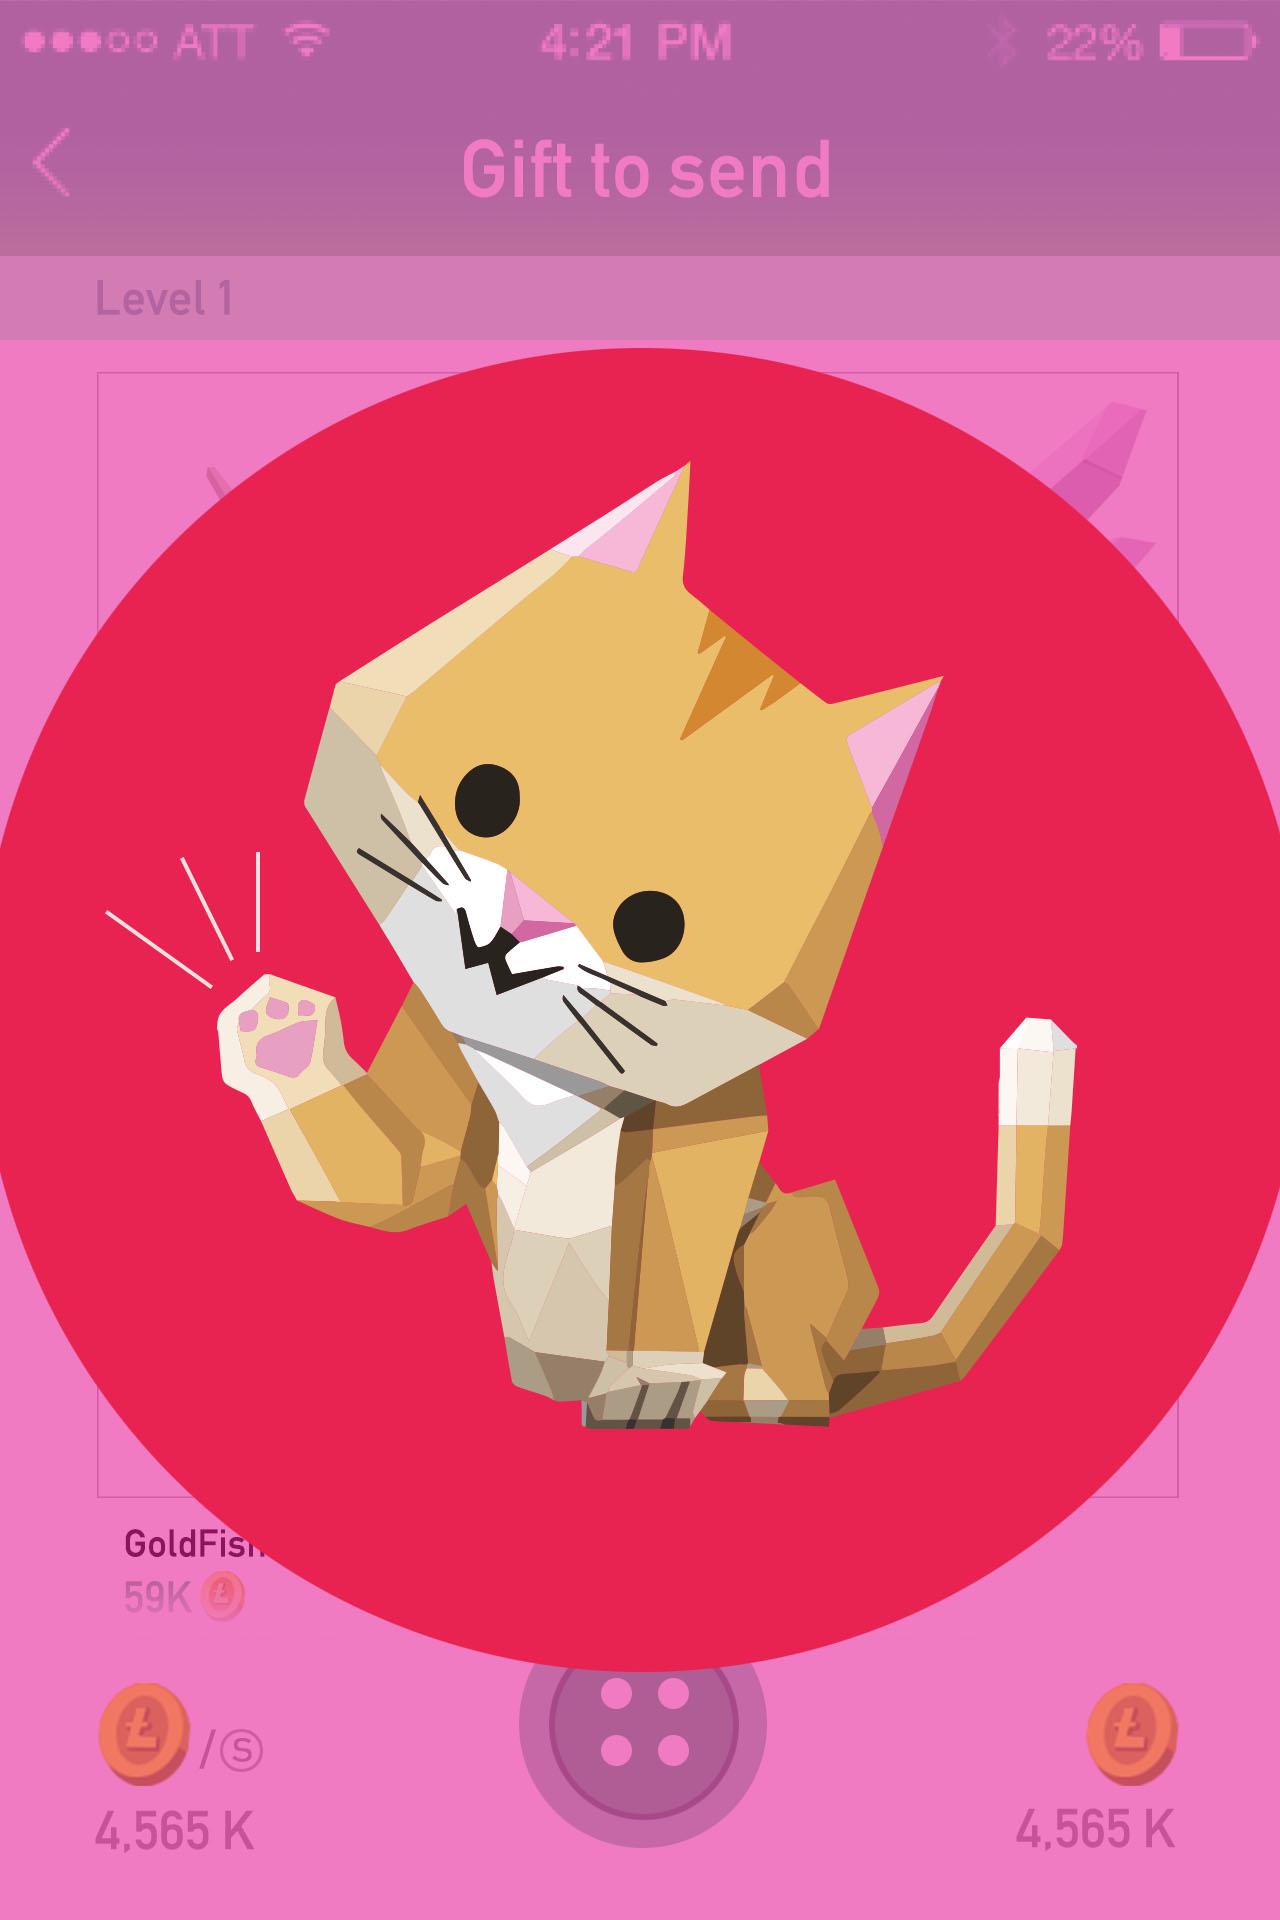 GiftToSend-JLL-NewAdditions1-kitten2